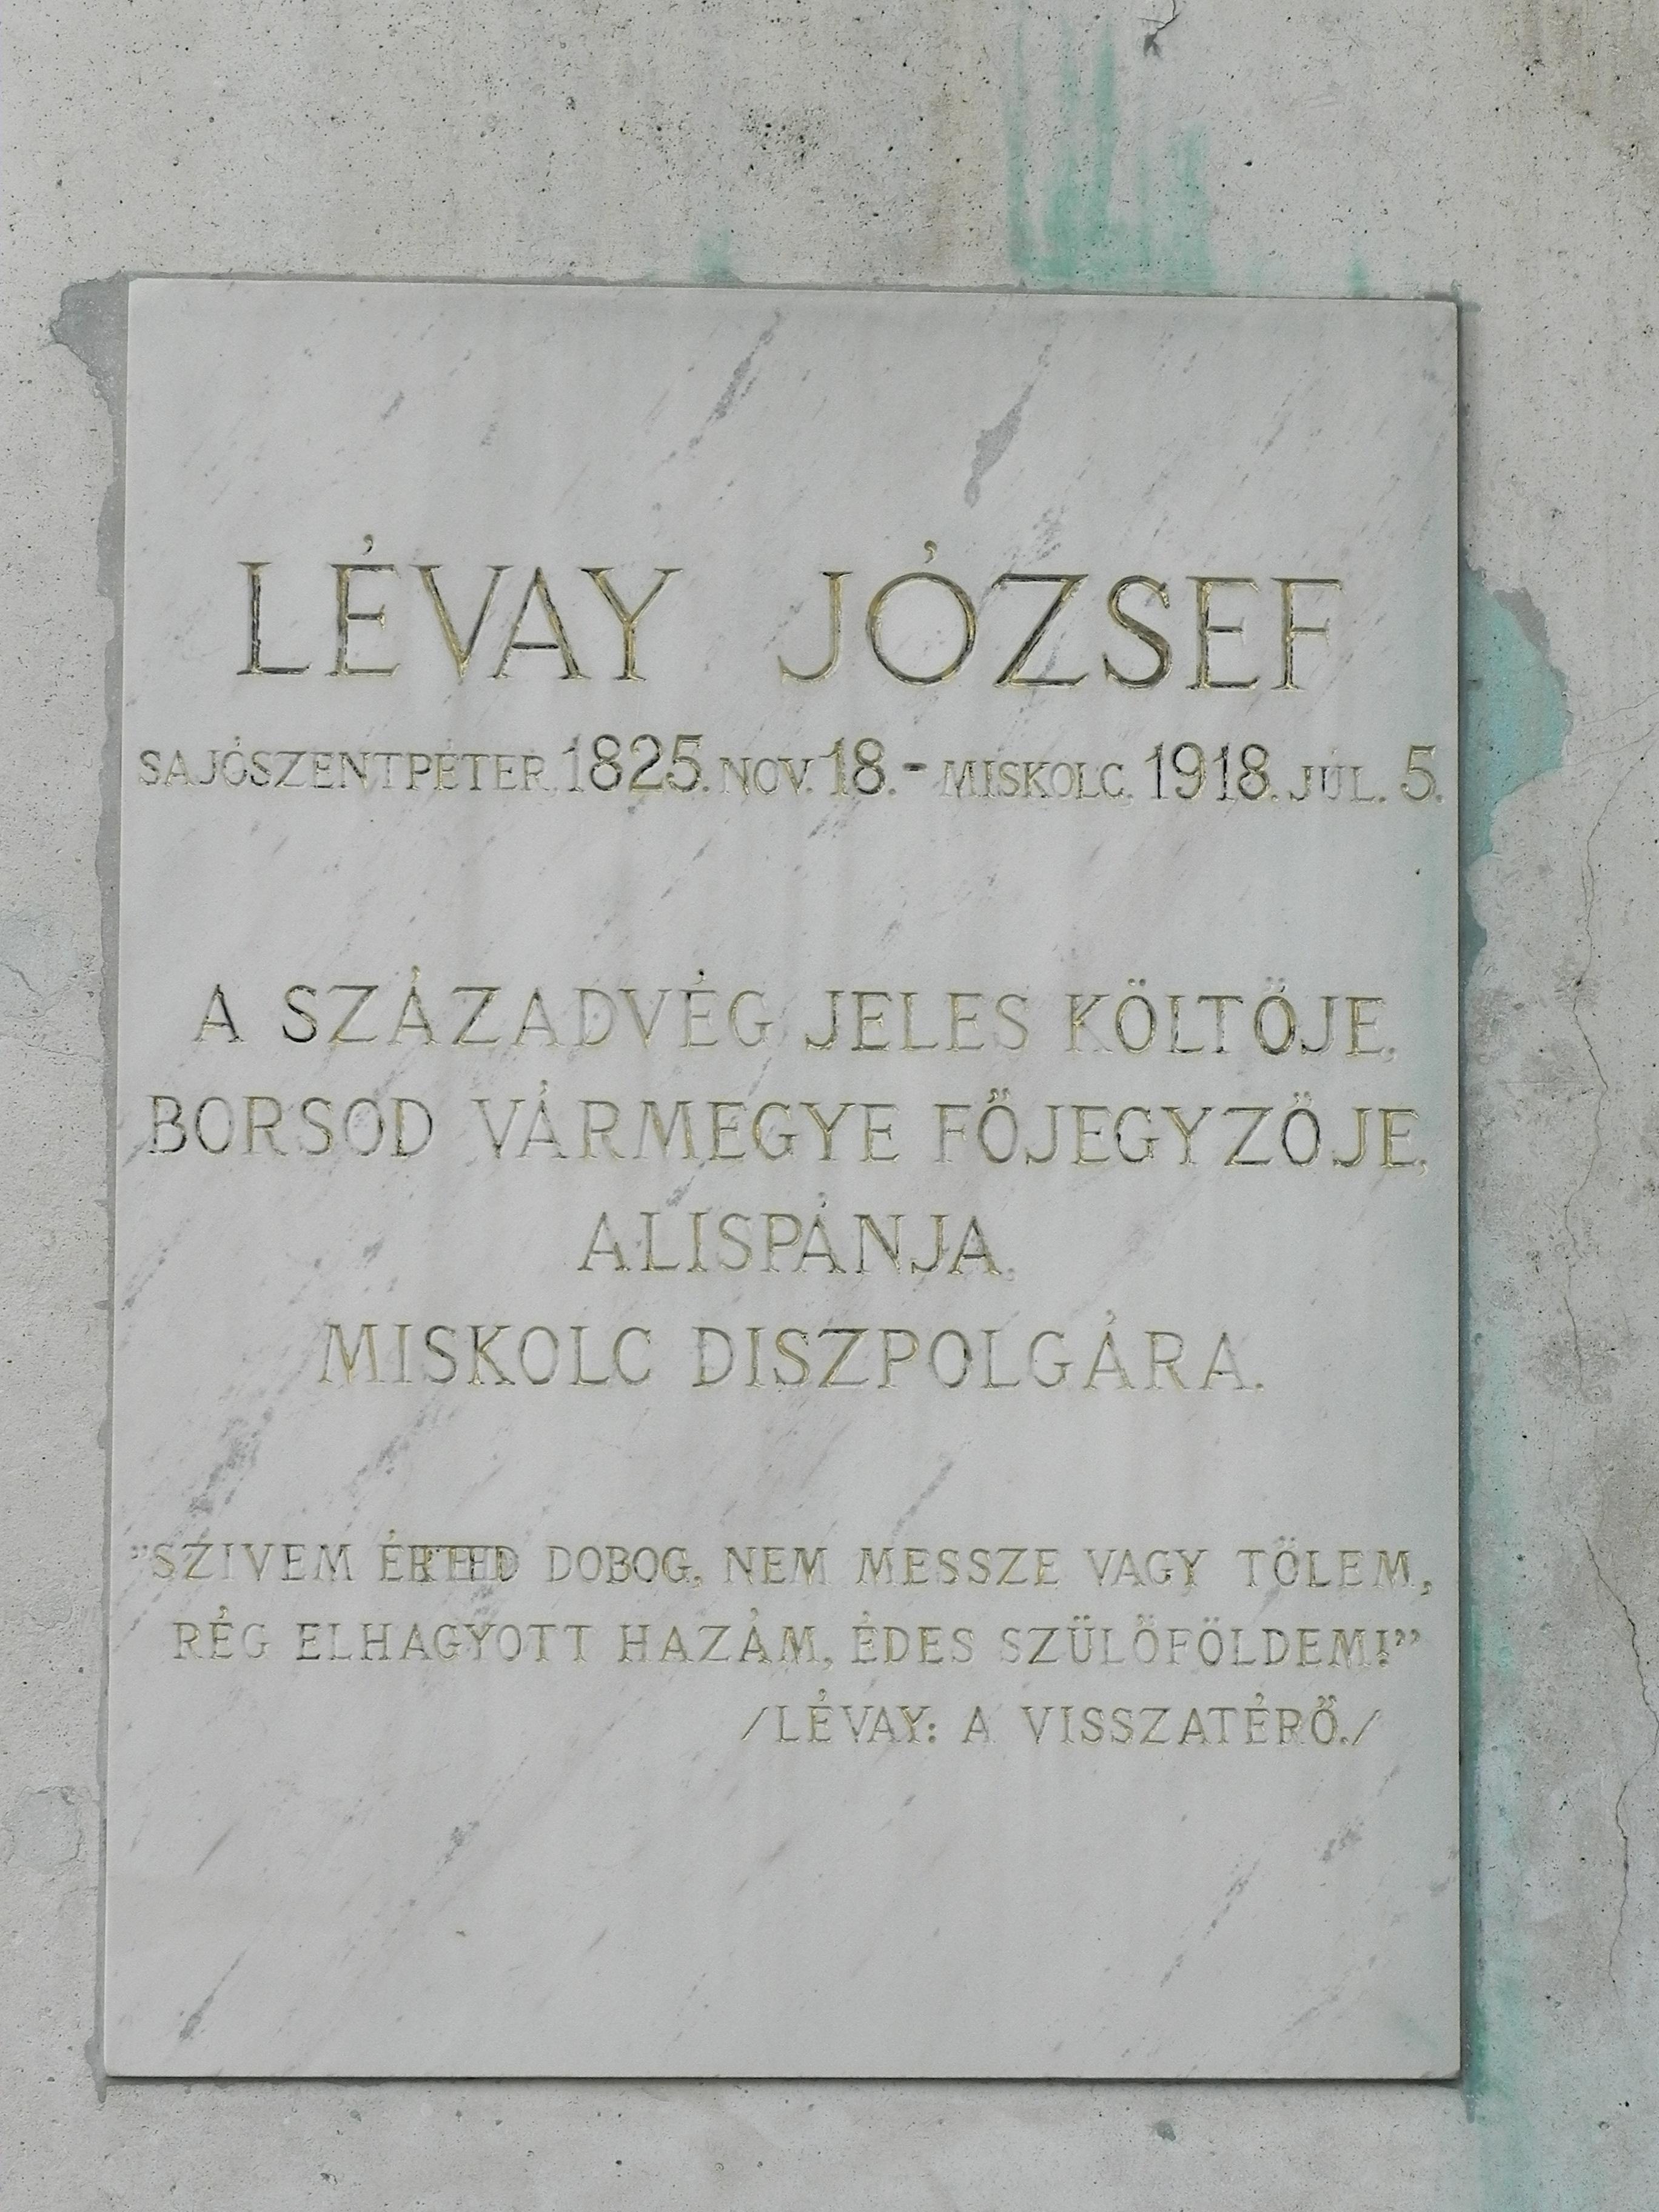 levay_jozsef_szobra_pd_2.JPG